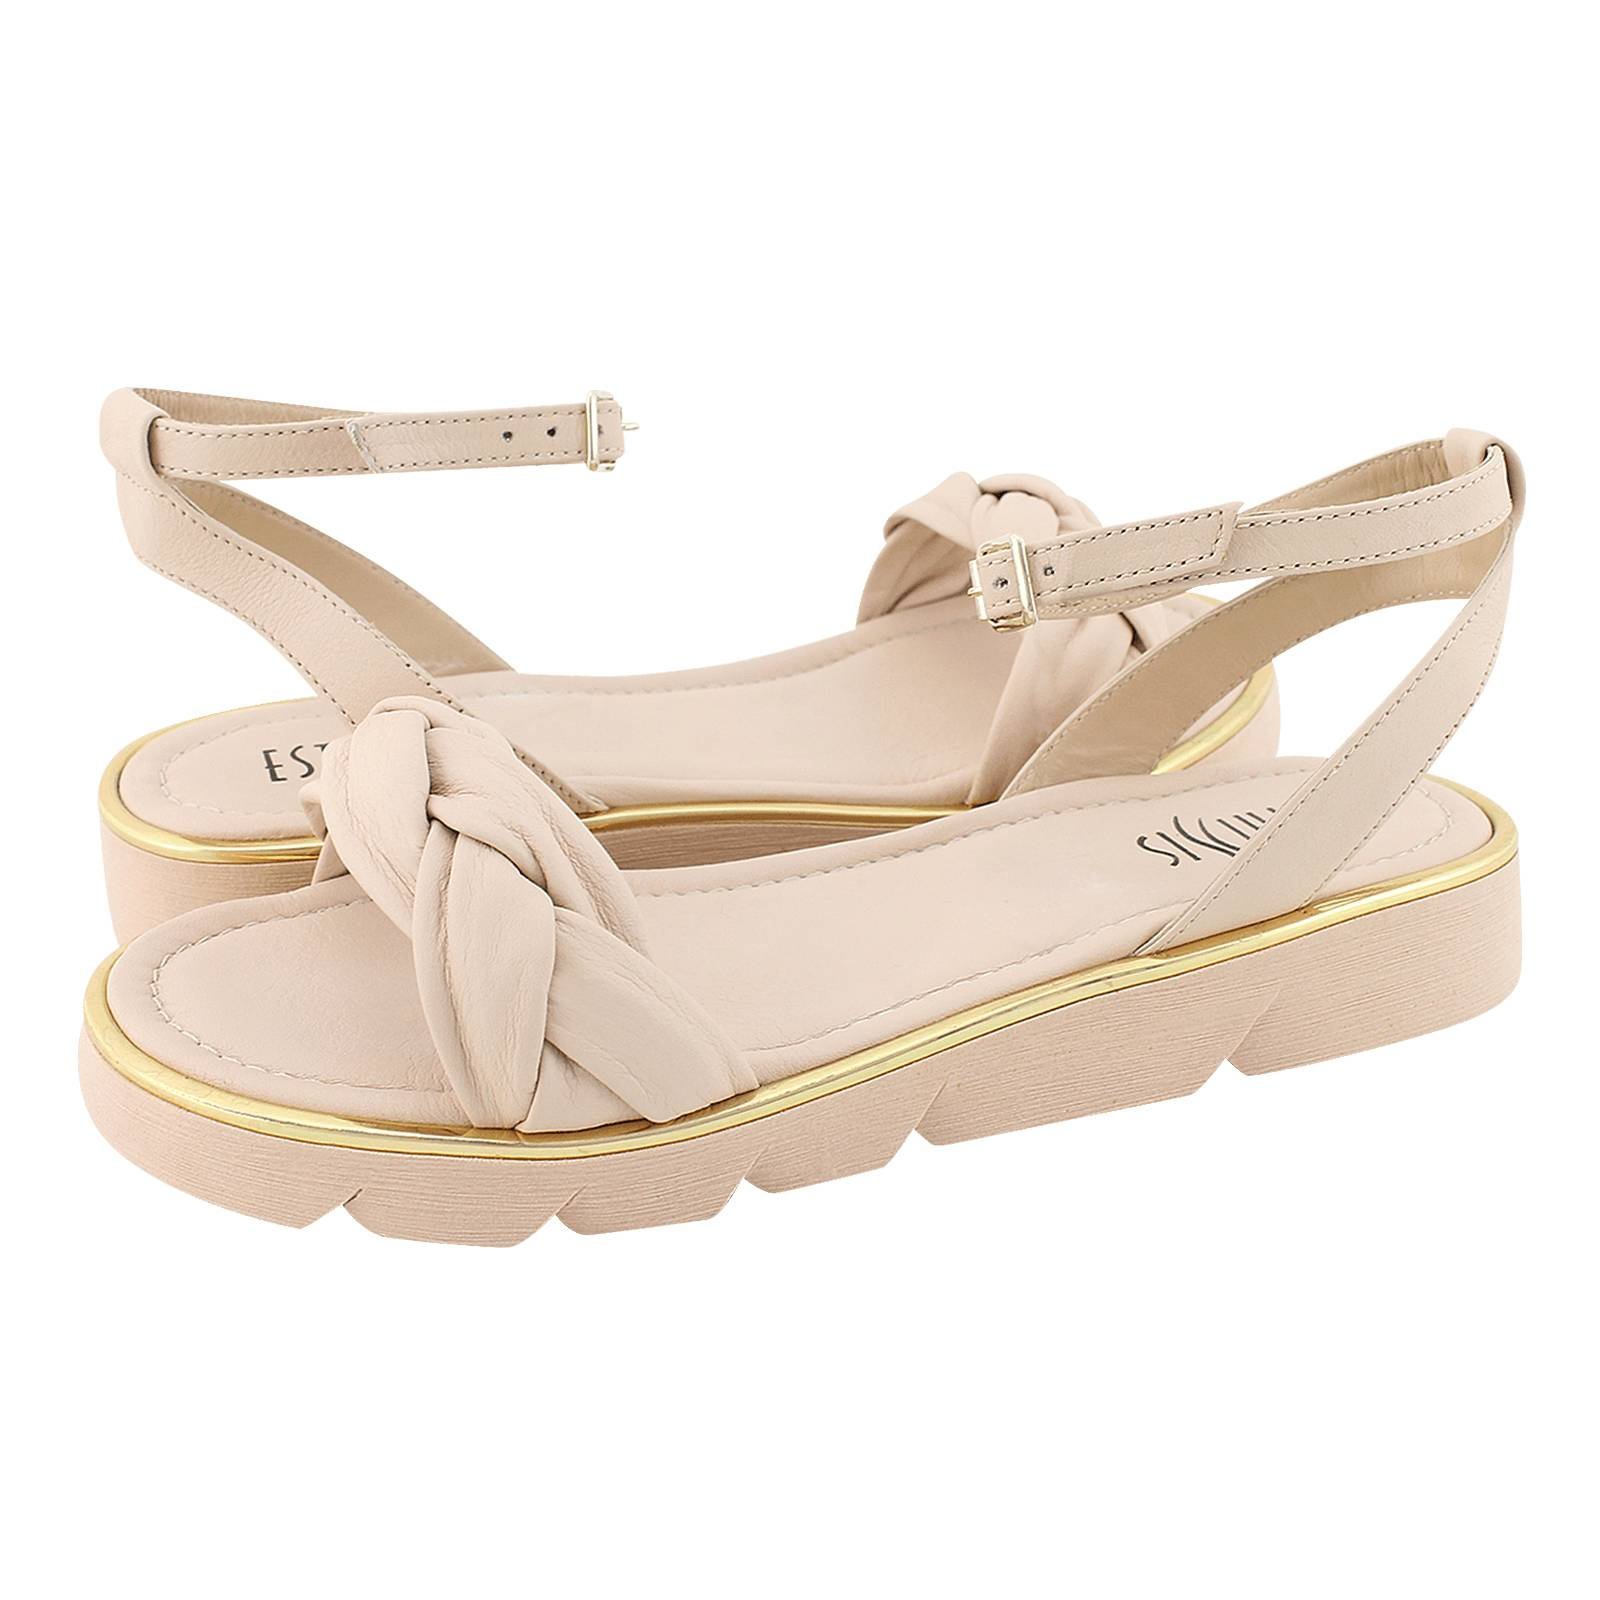 Esthissis Newbourn Sandals